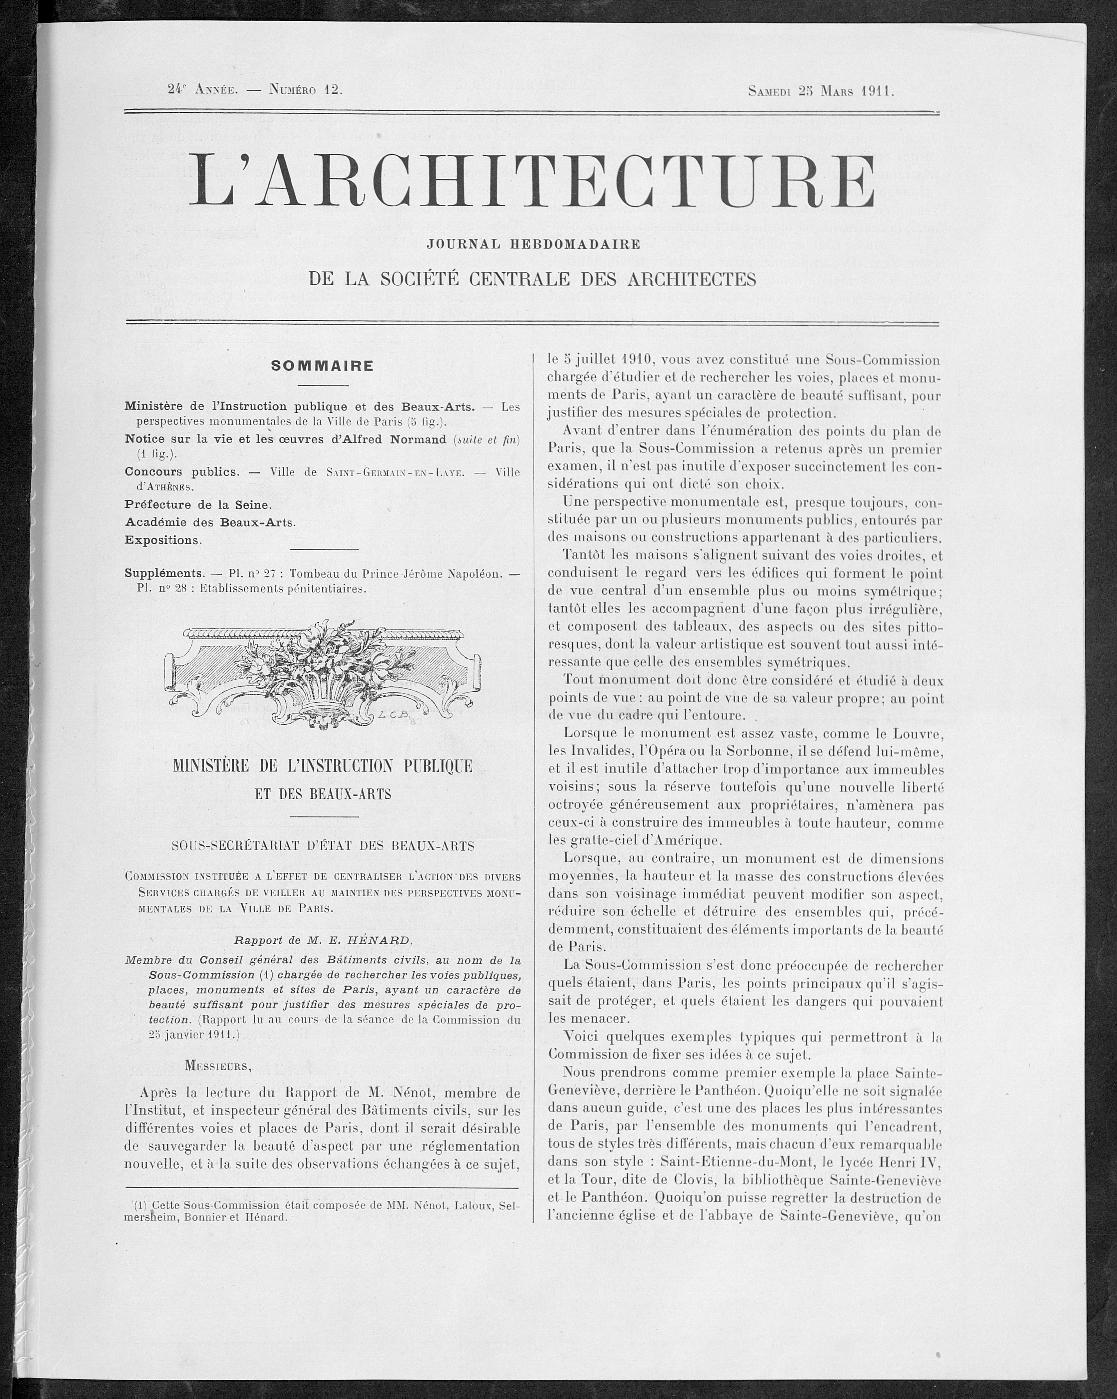 F:\Numerisation\TURE\FRAPN02_TURE_1911_12.pdf  